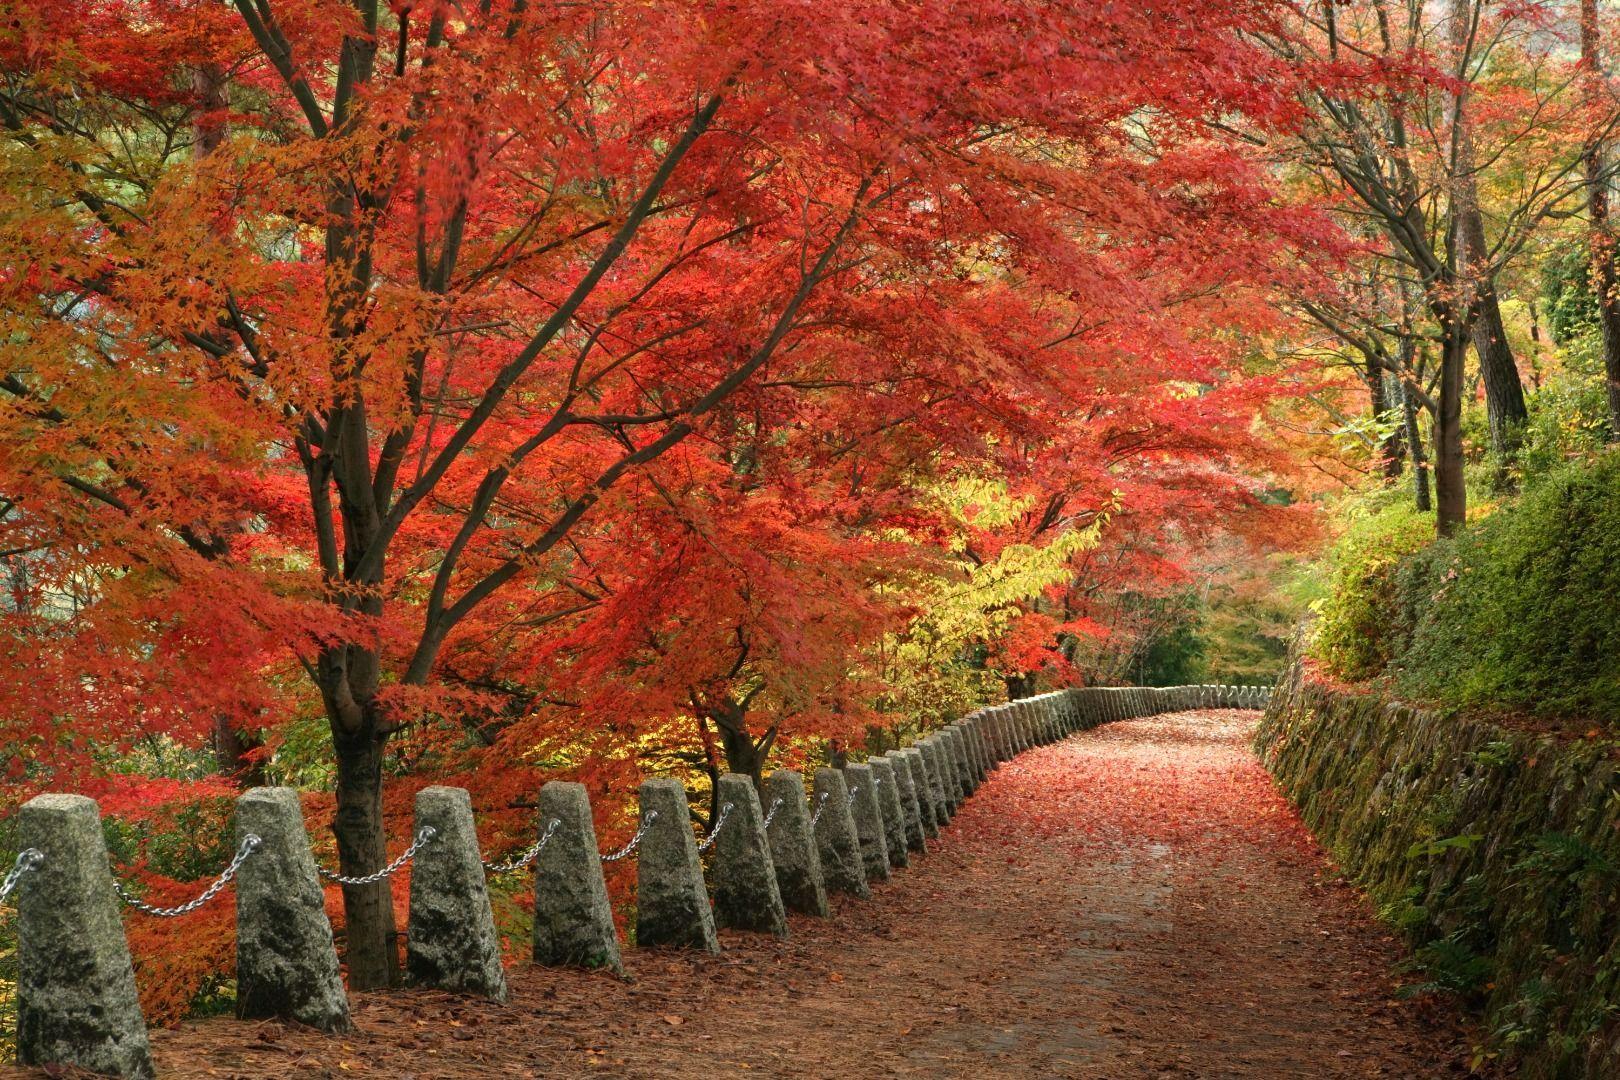 Equally Breathtaking in Autumn Mount Yoshino (Nara Prefecture)